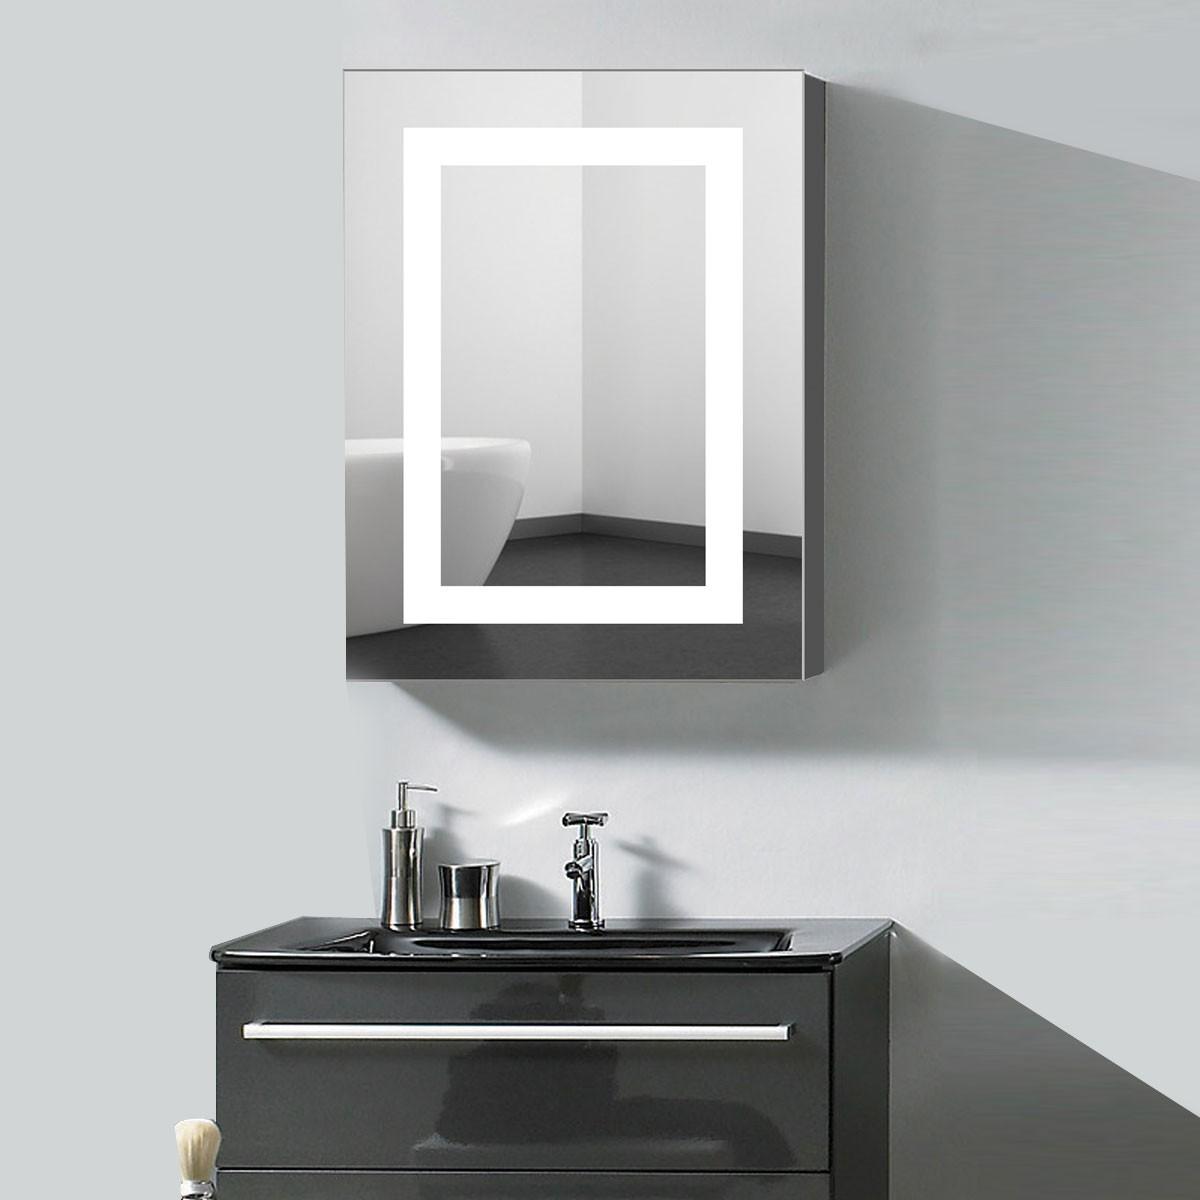 24 x 32 x 5 2 po Armoire miroir LED Salle de Bain en Position